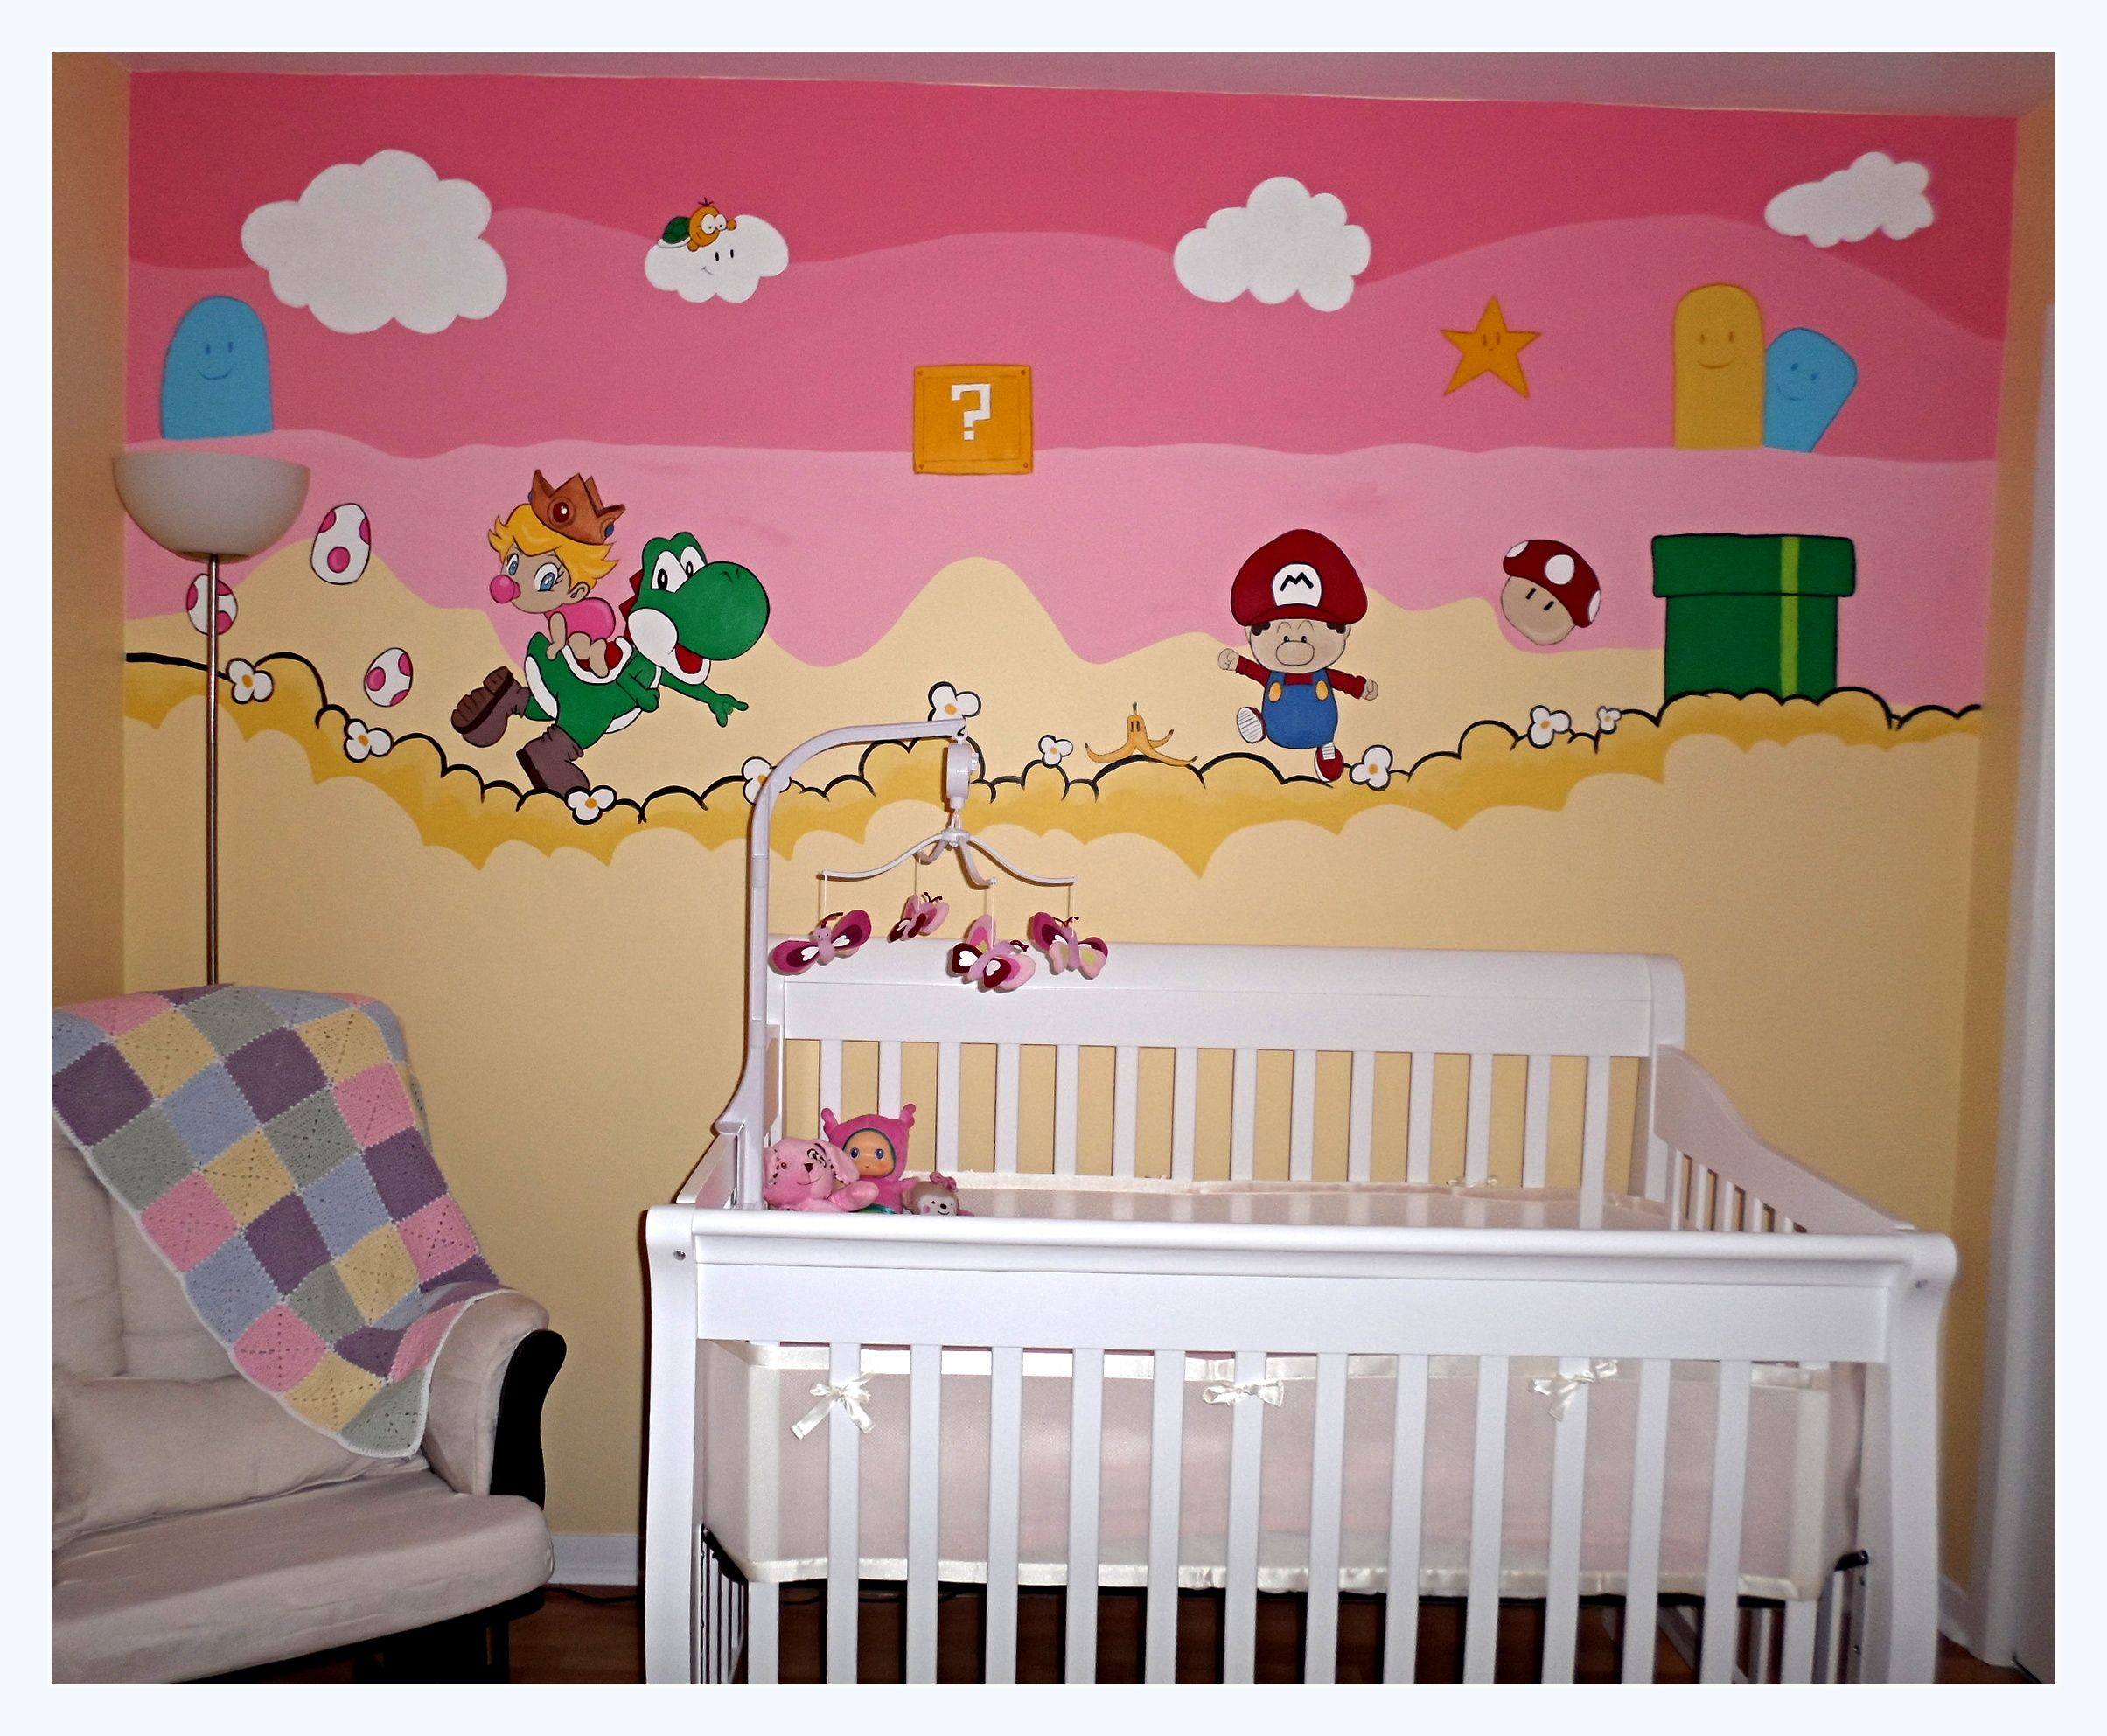 My Baby Girl S Nursery: My Awesome Super Mario Bros Themed Baby Girls Nursery